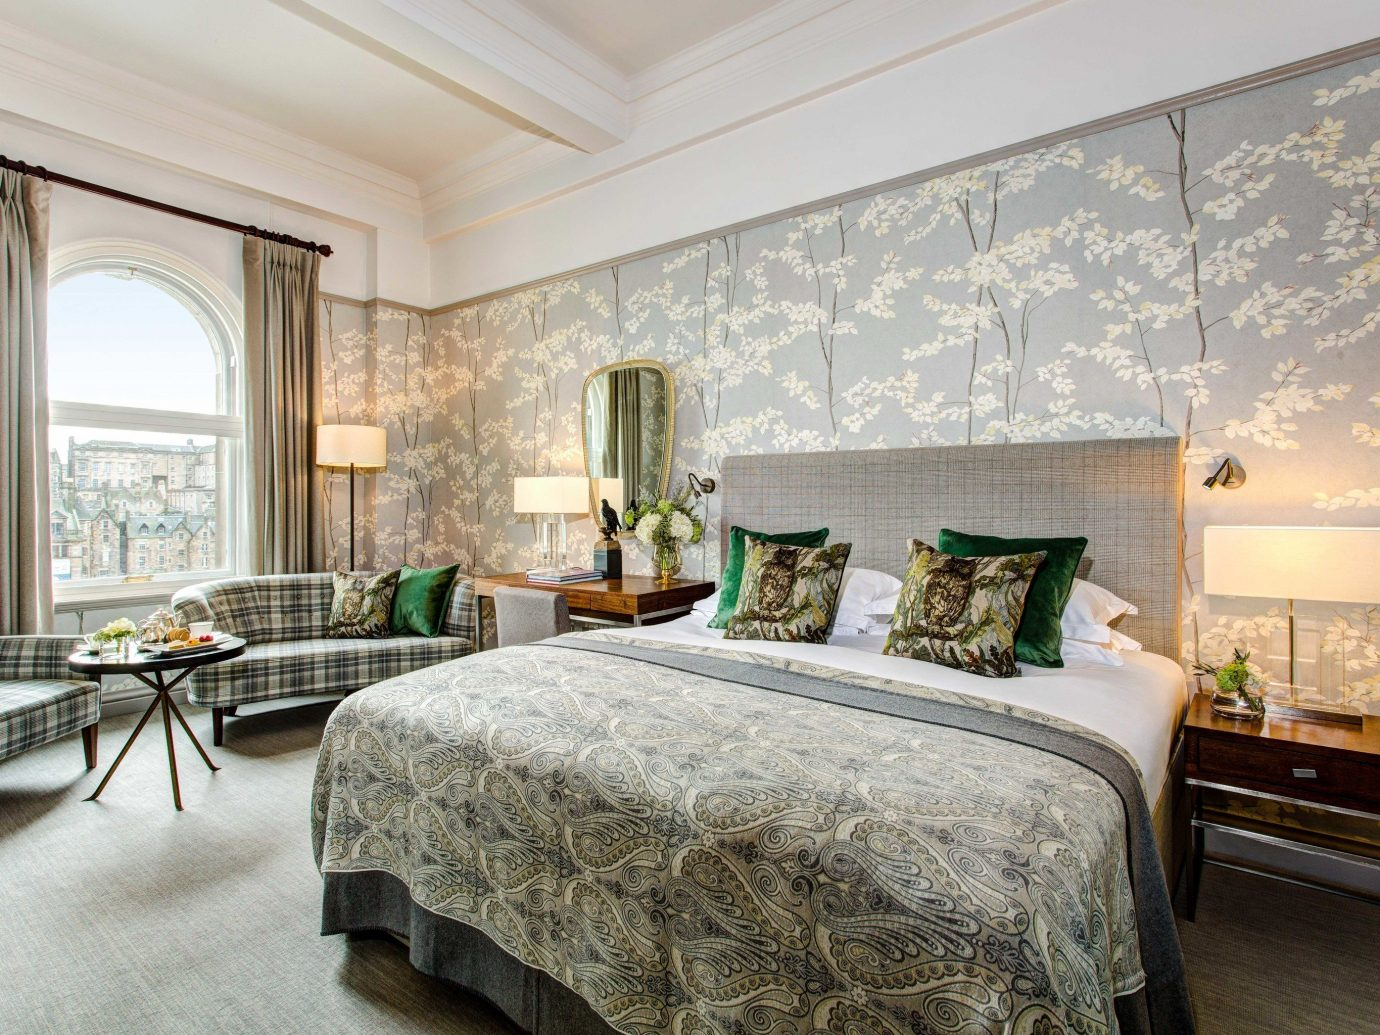 Bedroom at The Balmoral